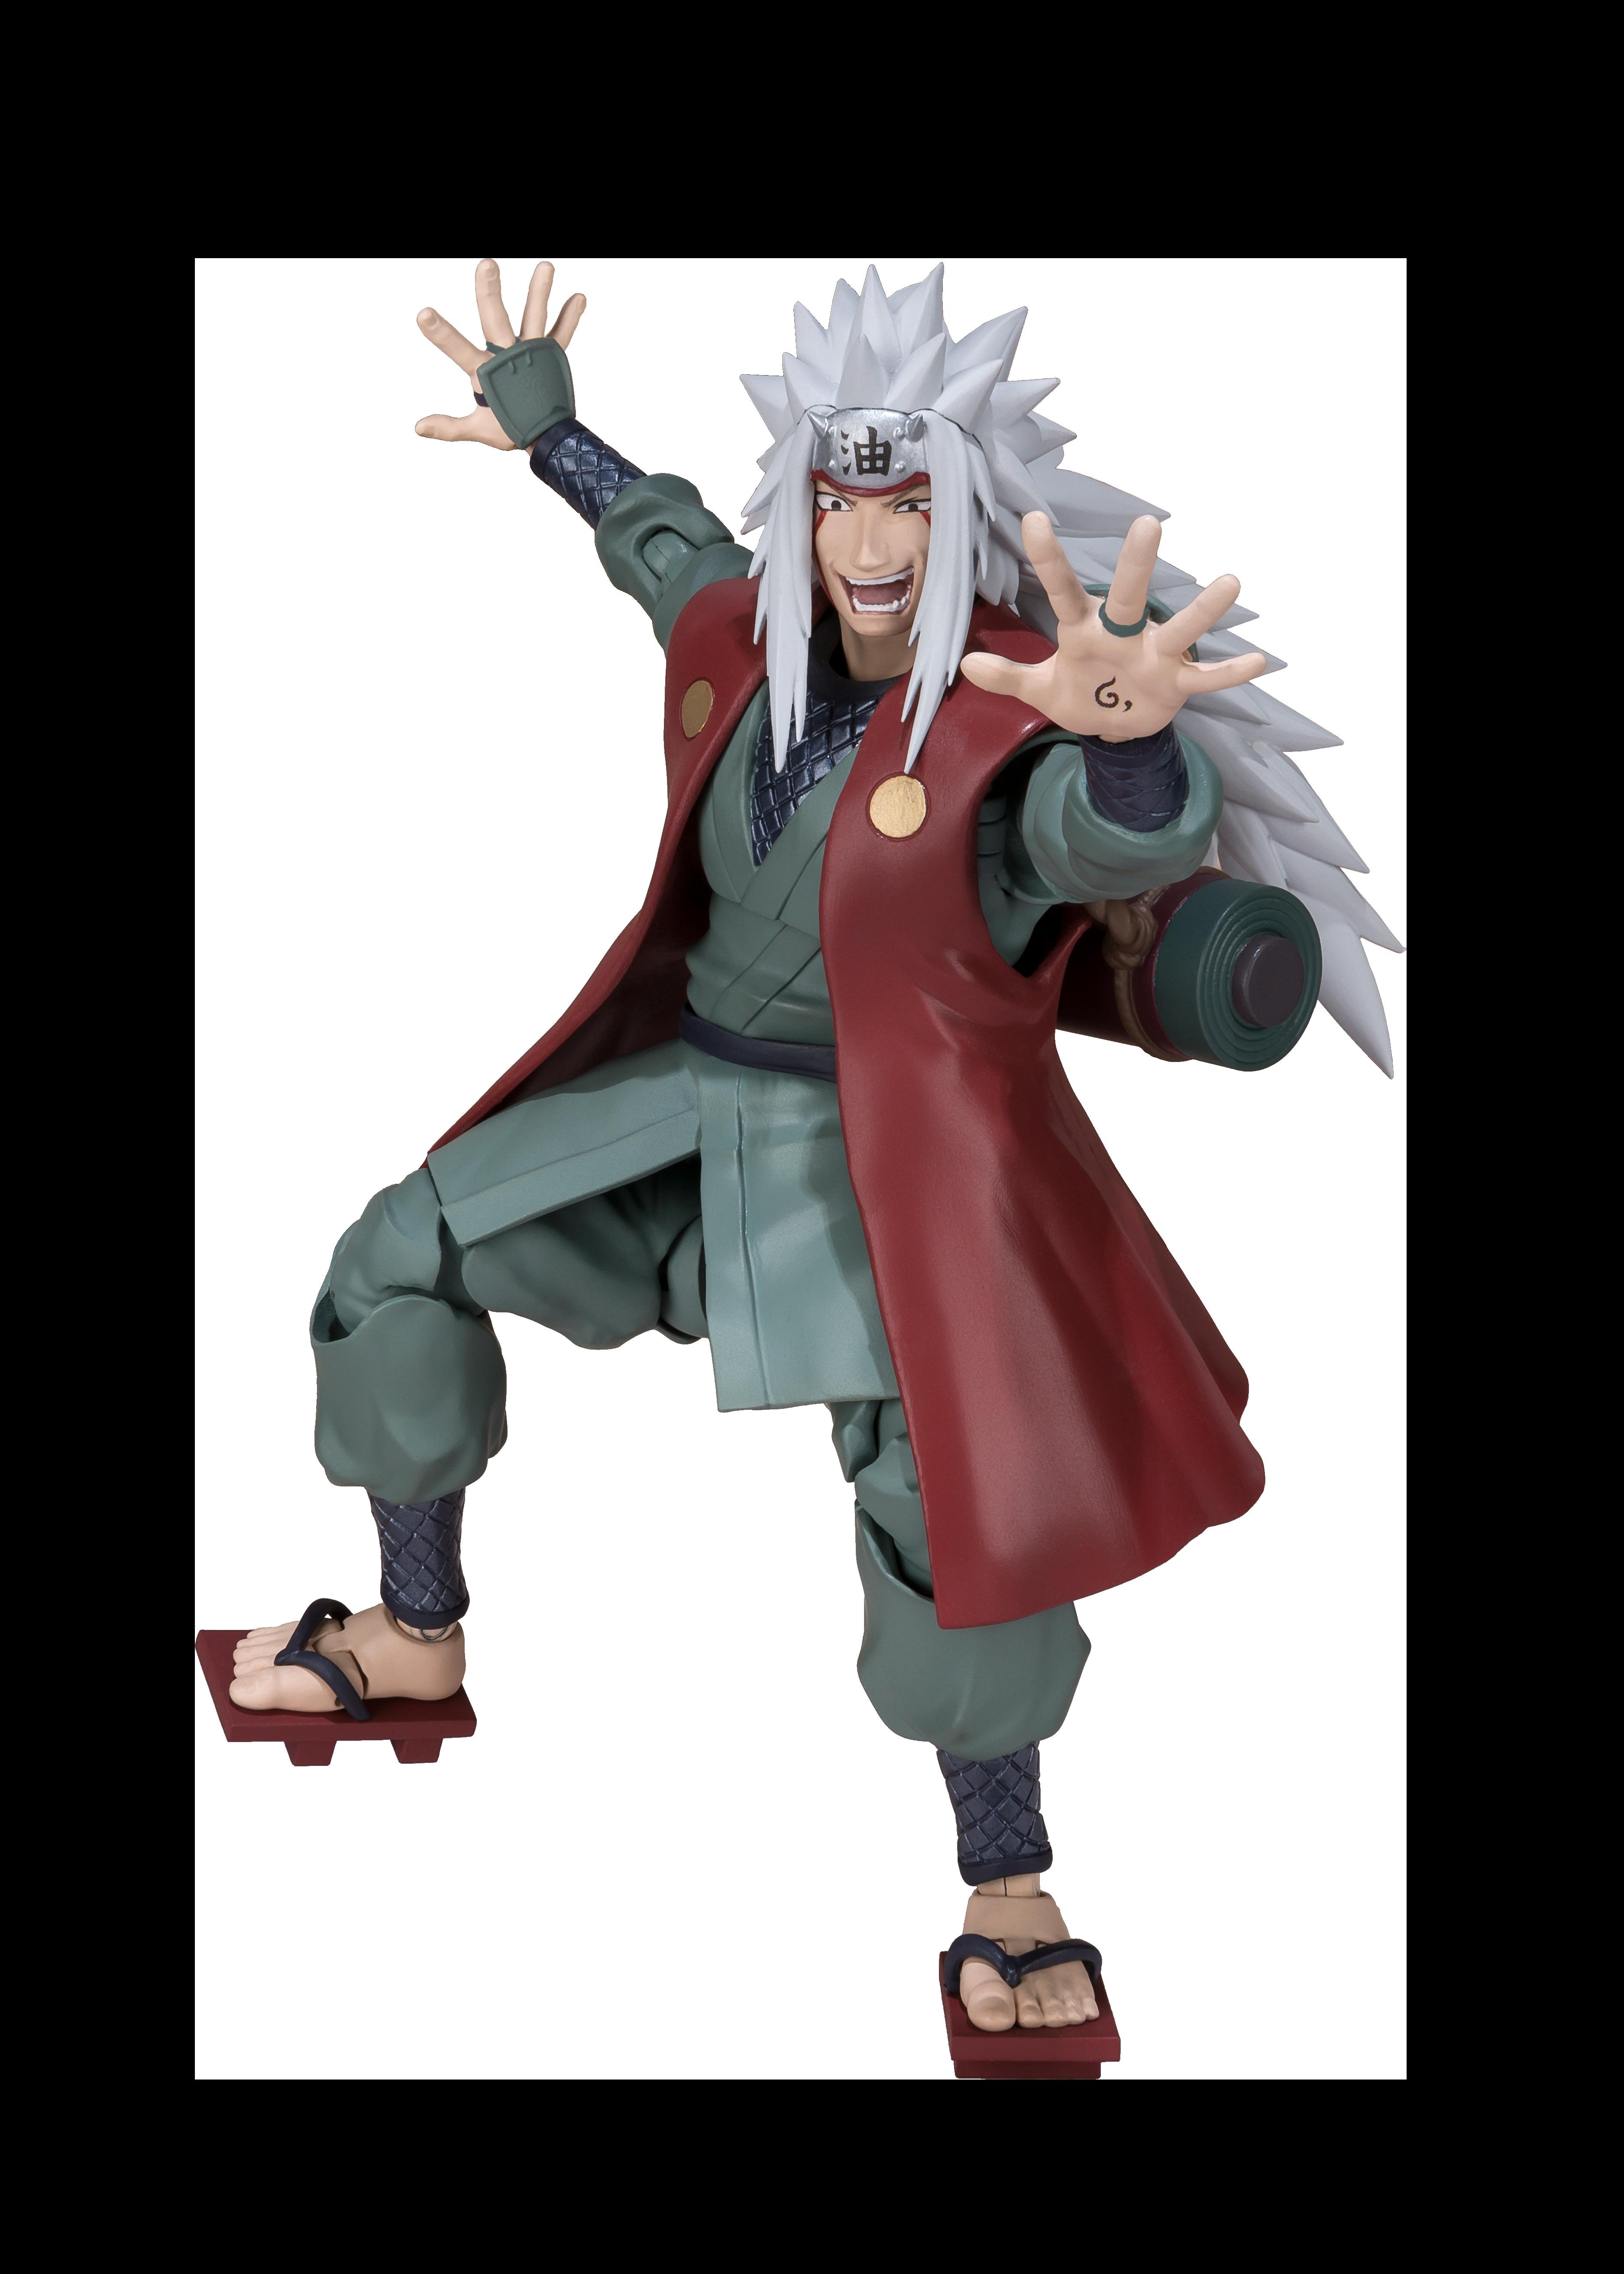 Naruto Shippuden Jiraiya S H Figuarts Action Figure Gamestop